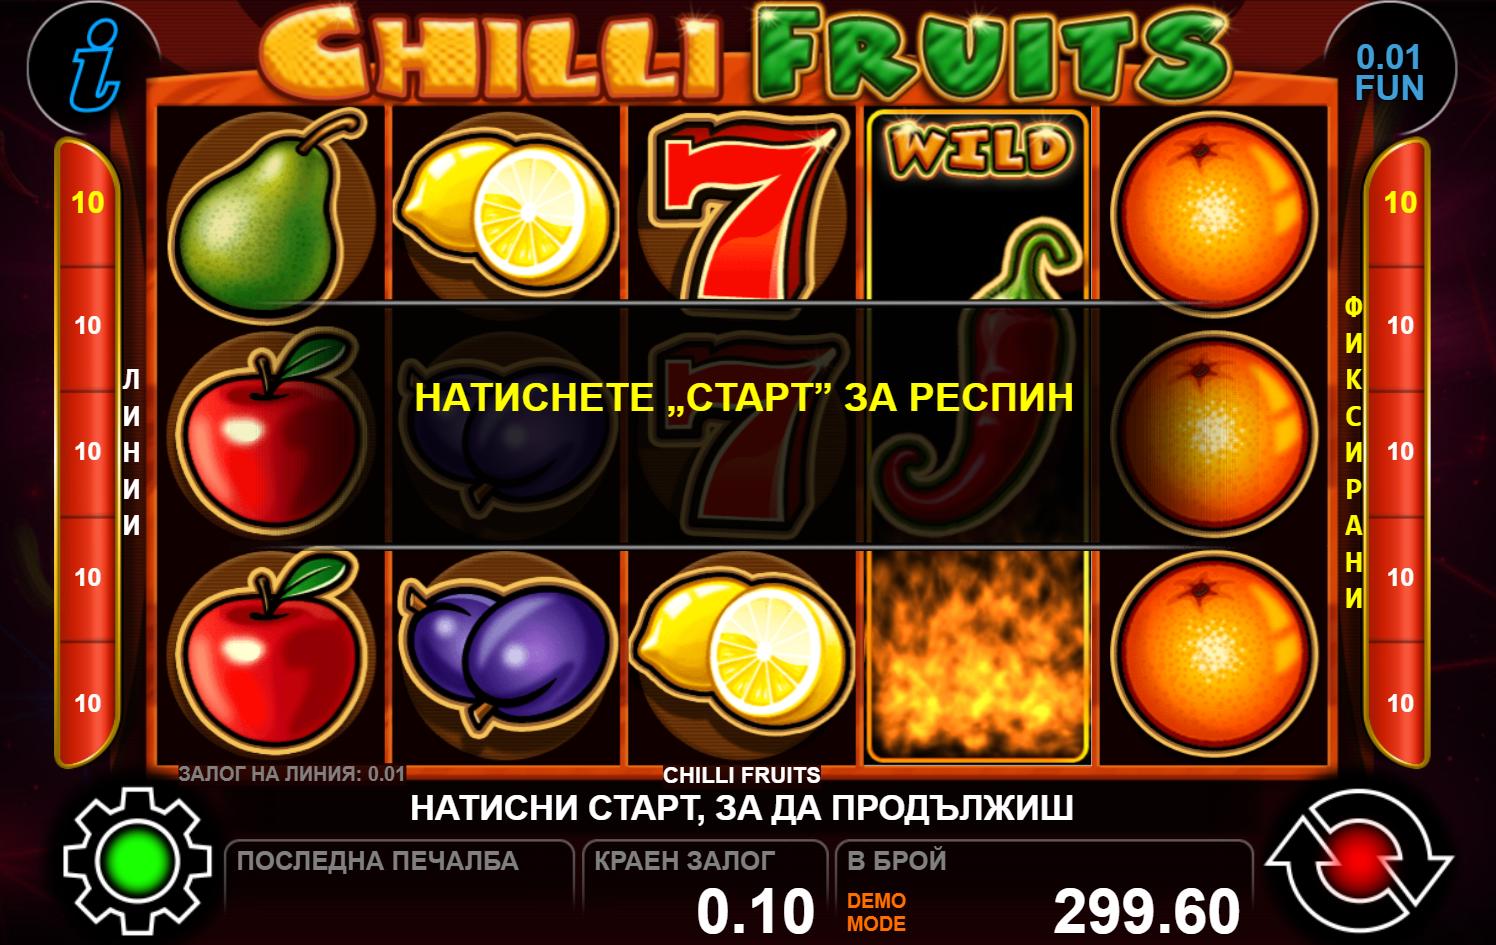 chilli fruits ct gaming-komarbet.com